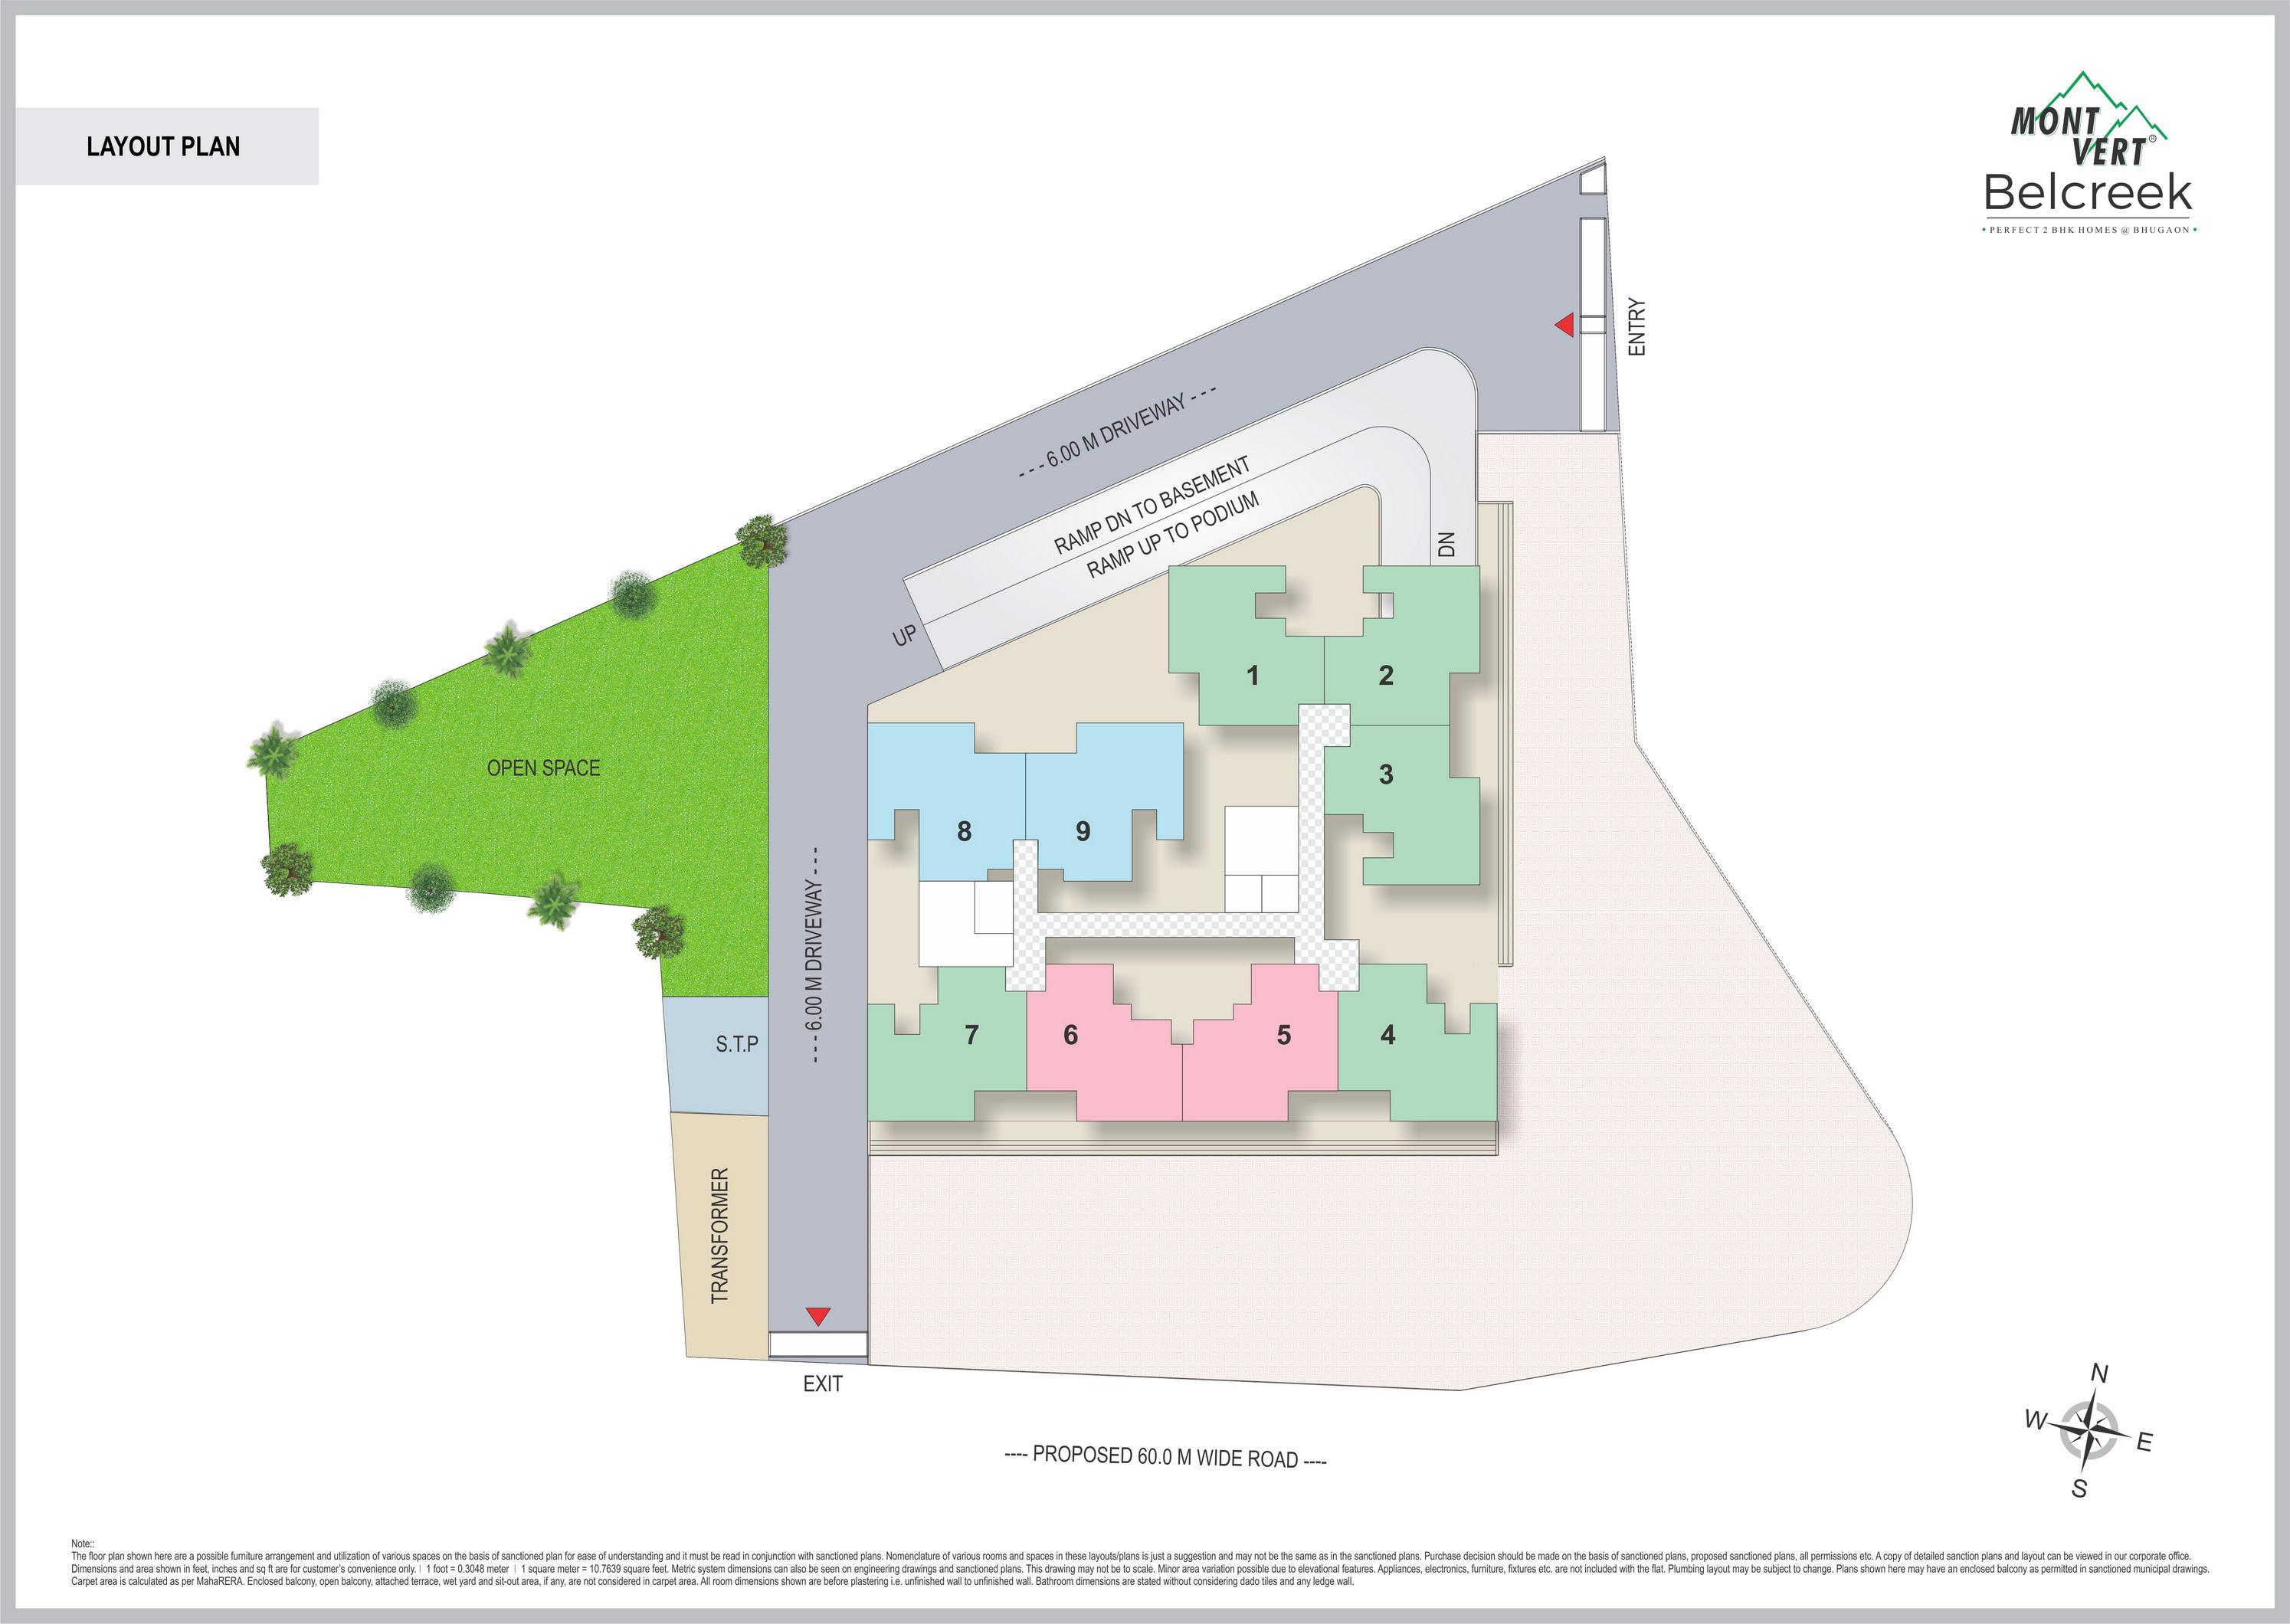 Layout Plan – residential-project-in-bavdhan-mont-vert-belcreek-layout-plan